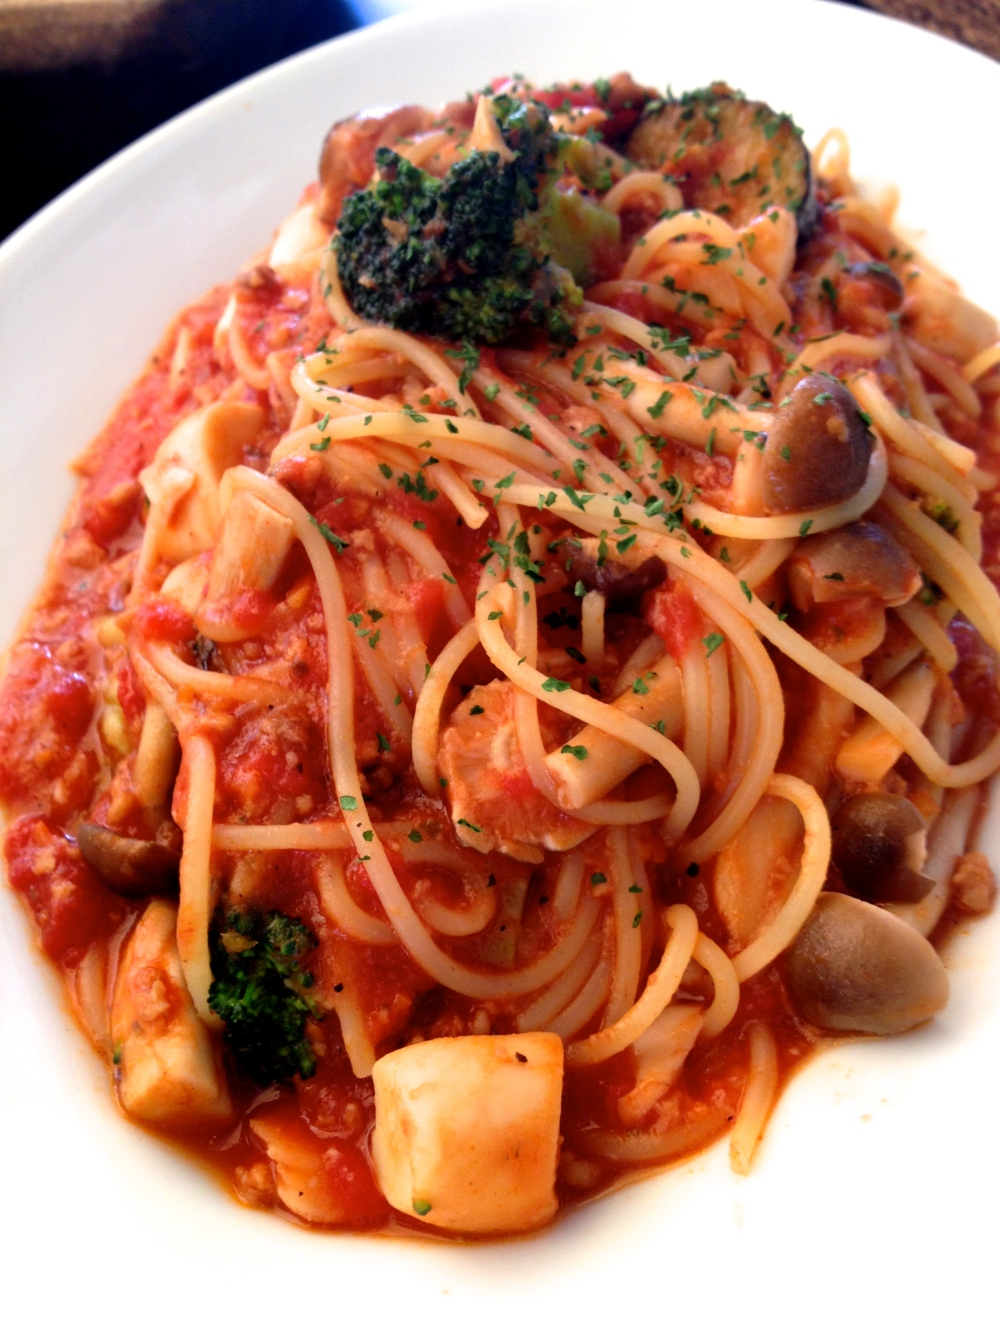 A tomato based seafood pasta